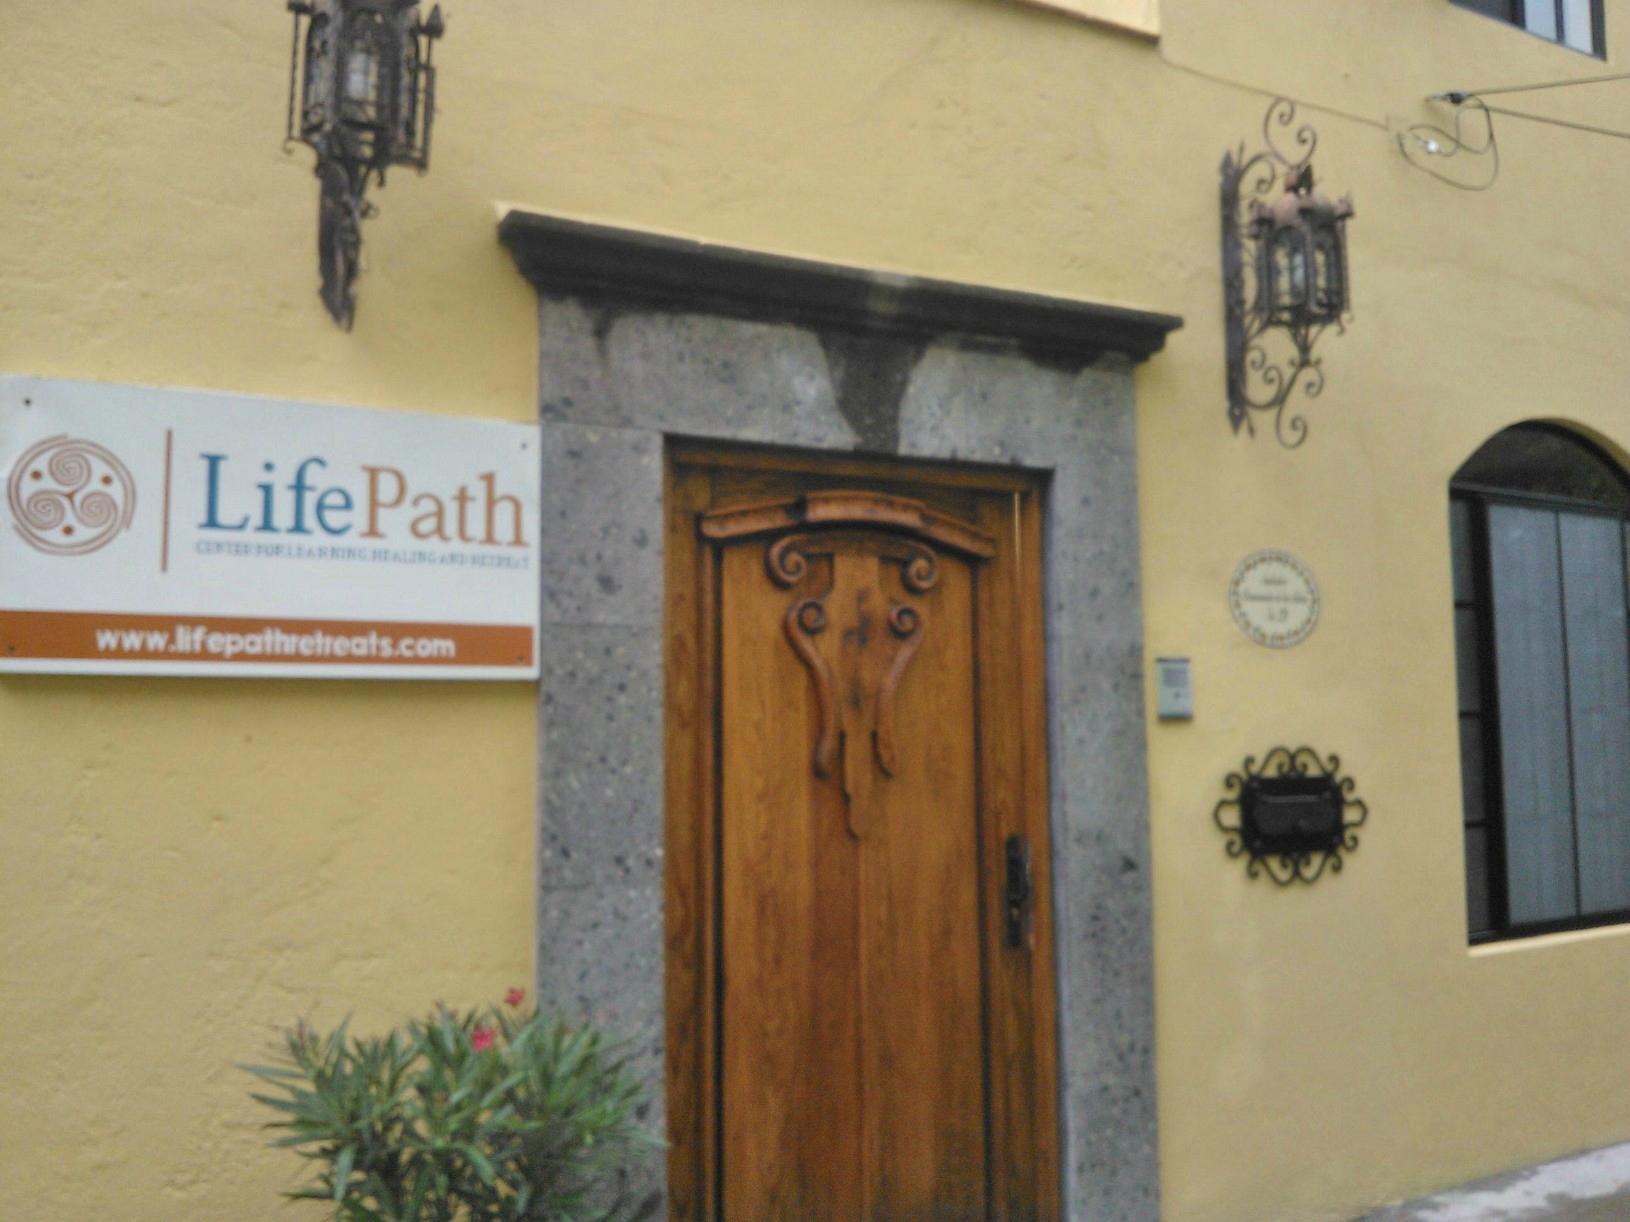 LifePath Center